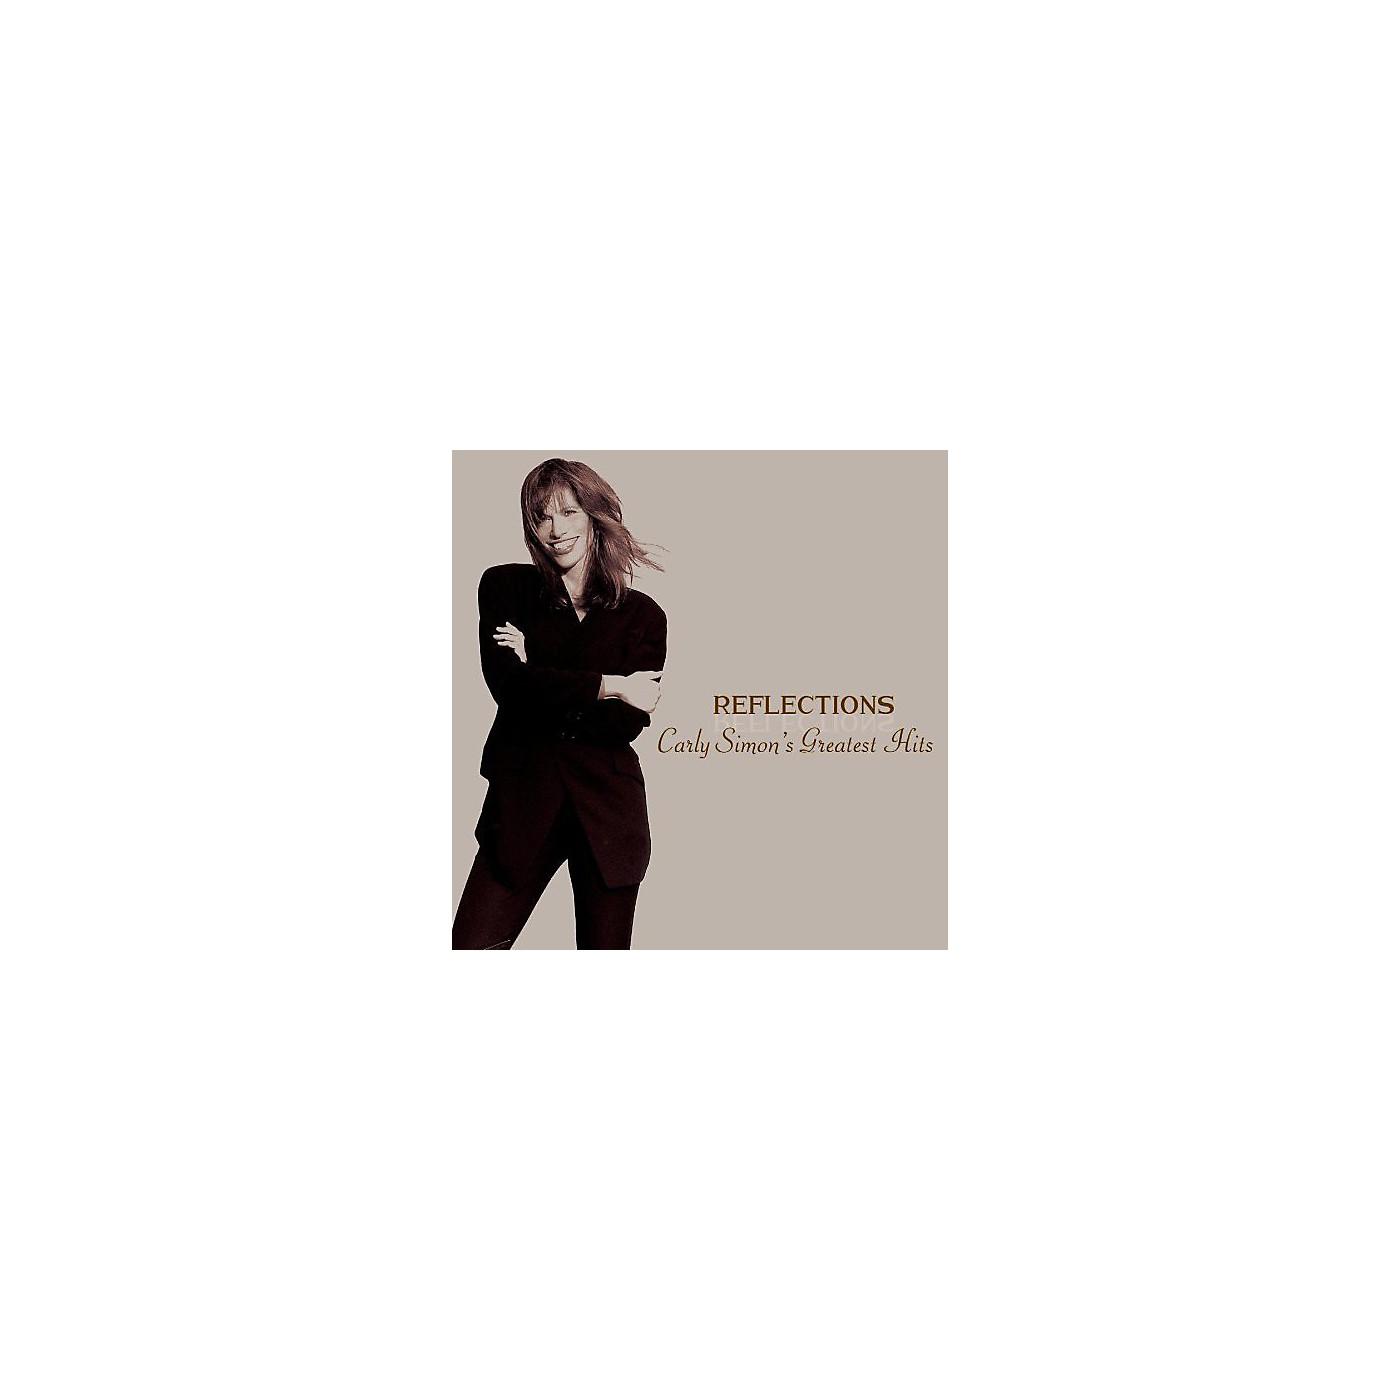 Alliance Carly Simon - Reflections: Carly Simon's Greatest Hits (CD) thumbnail